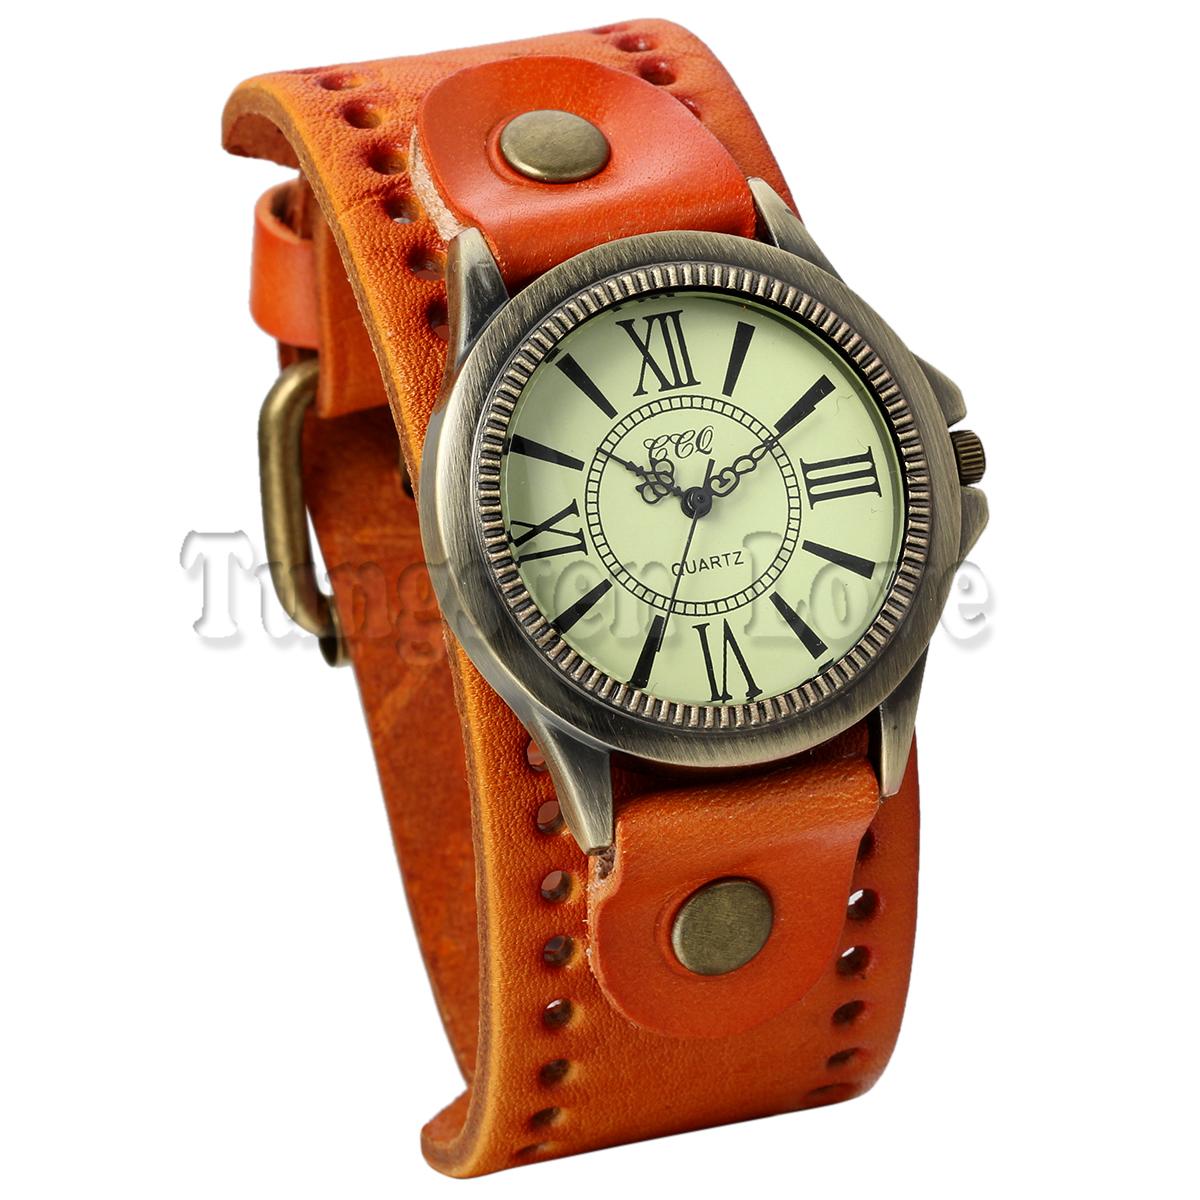 TungstenLove Vintage Leather Bracelet Watch With Antique Brass Bronze Tone Bezel(China (Mainland))